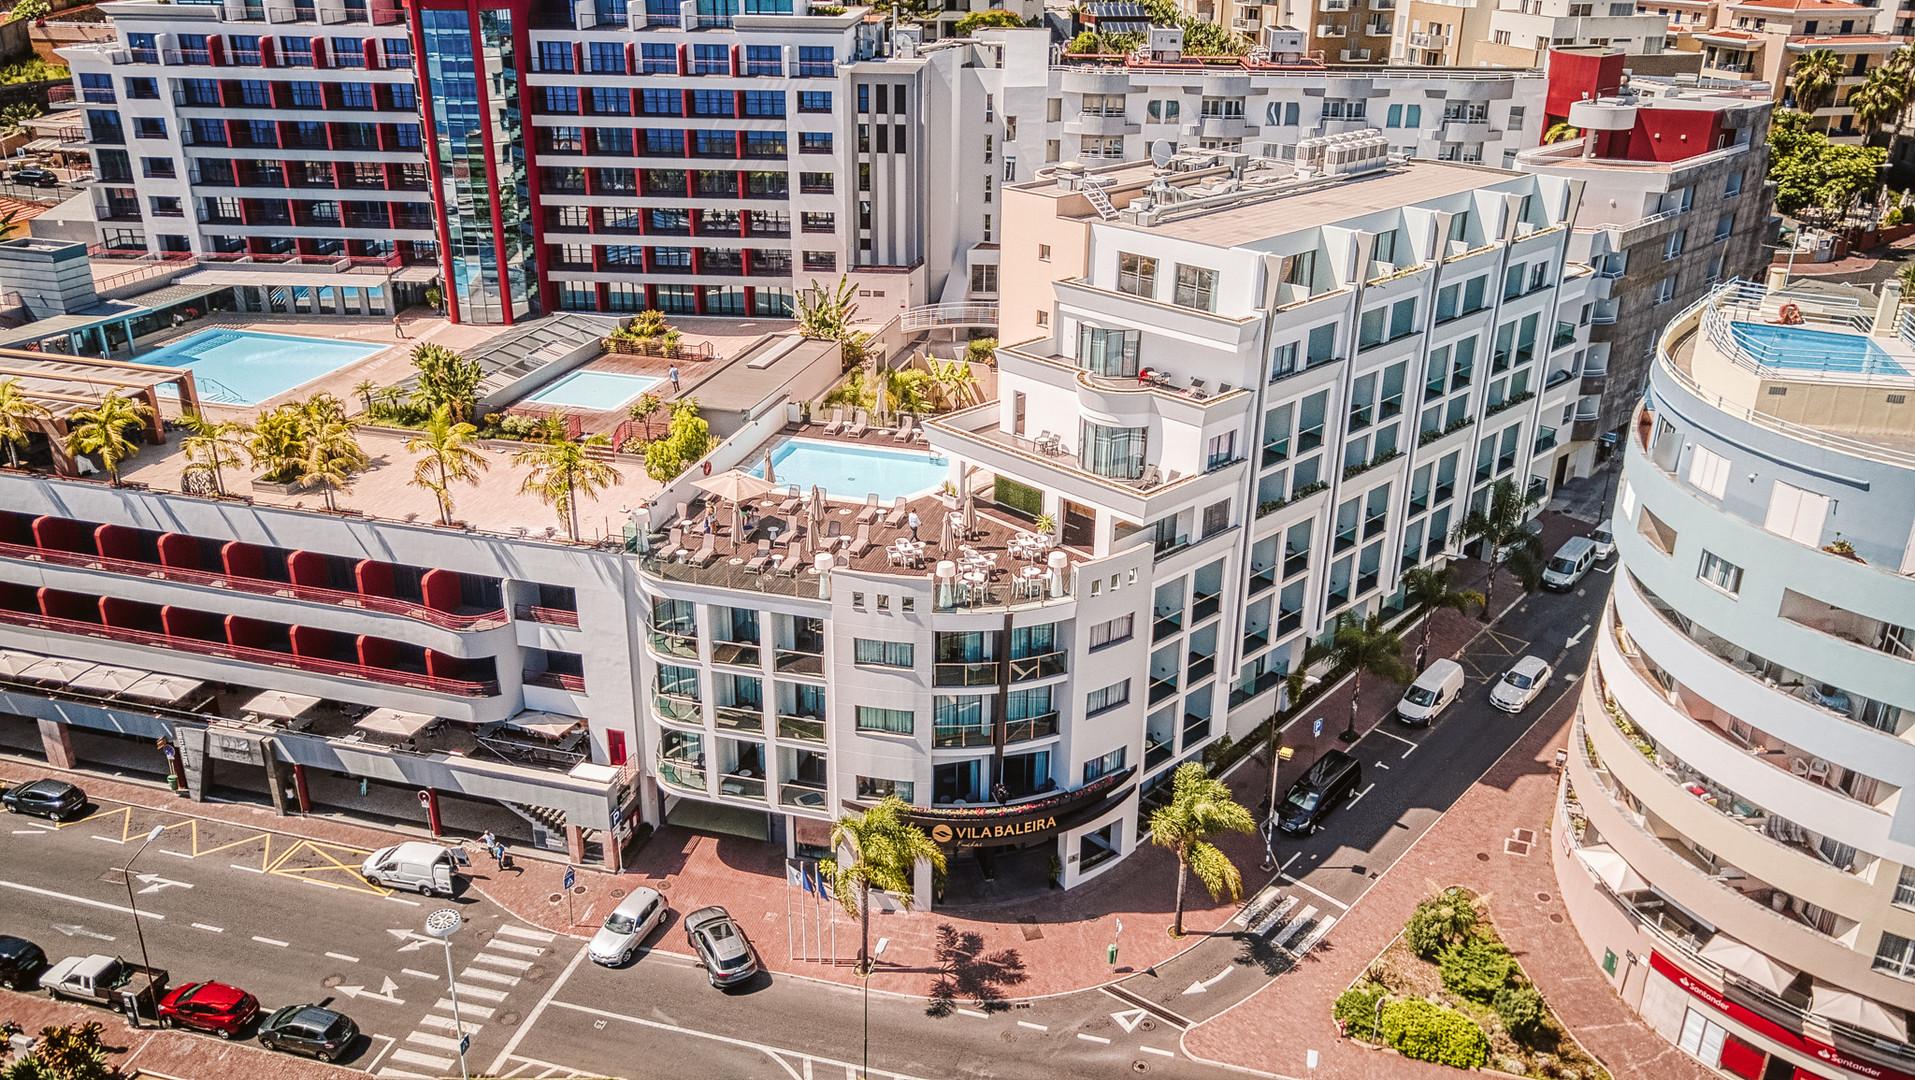 Hotel Vila Baleira Funchal #3